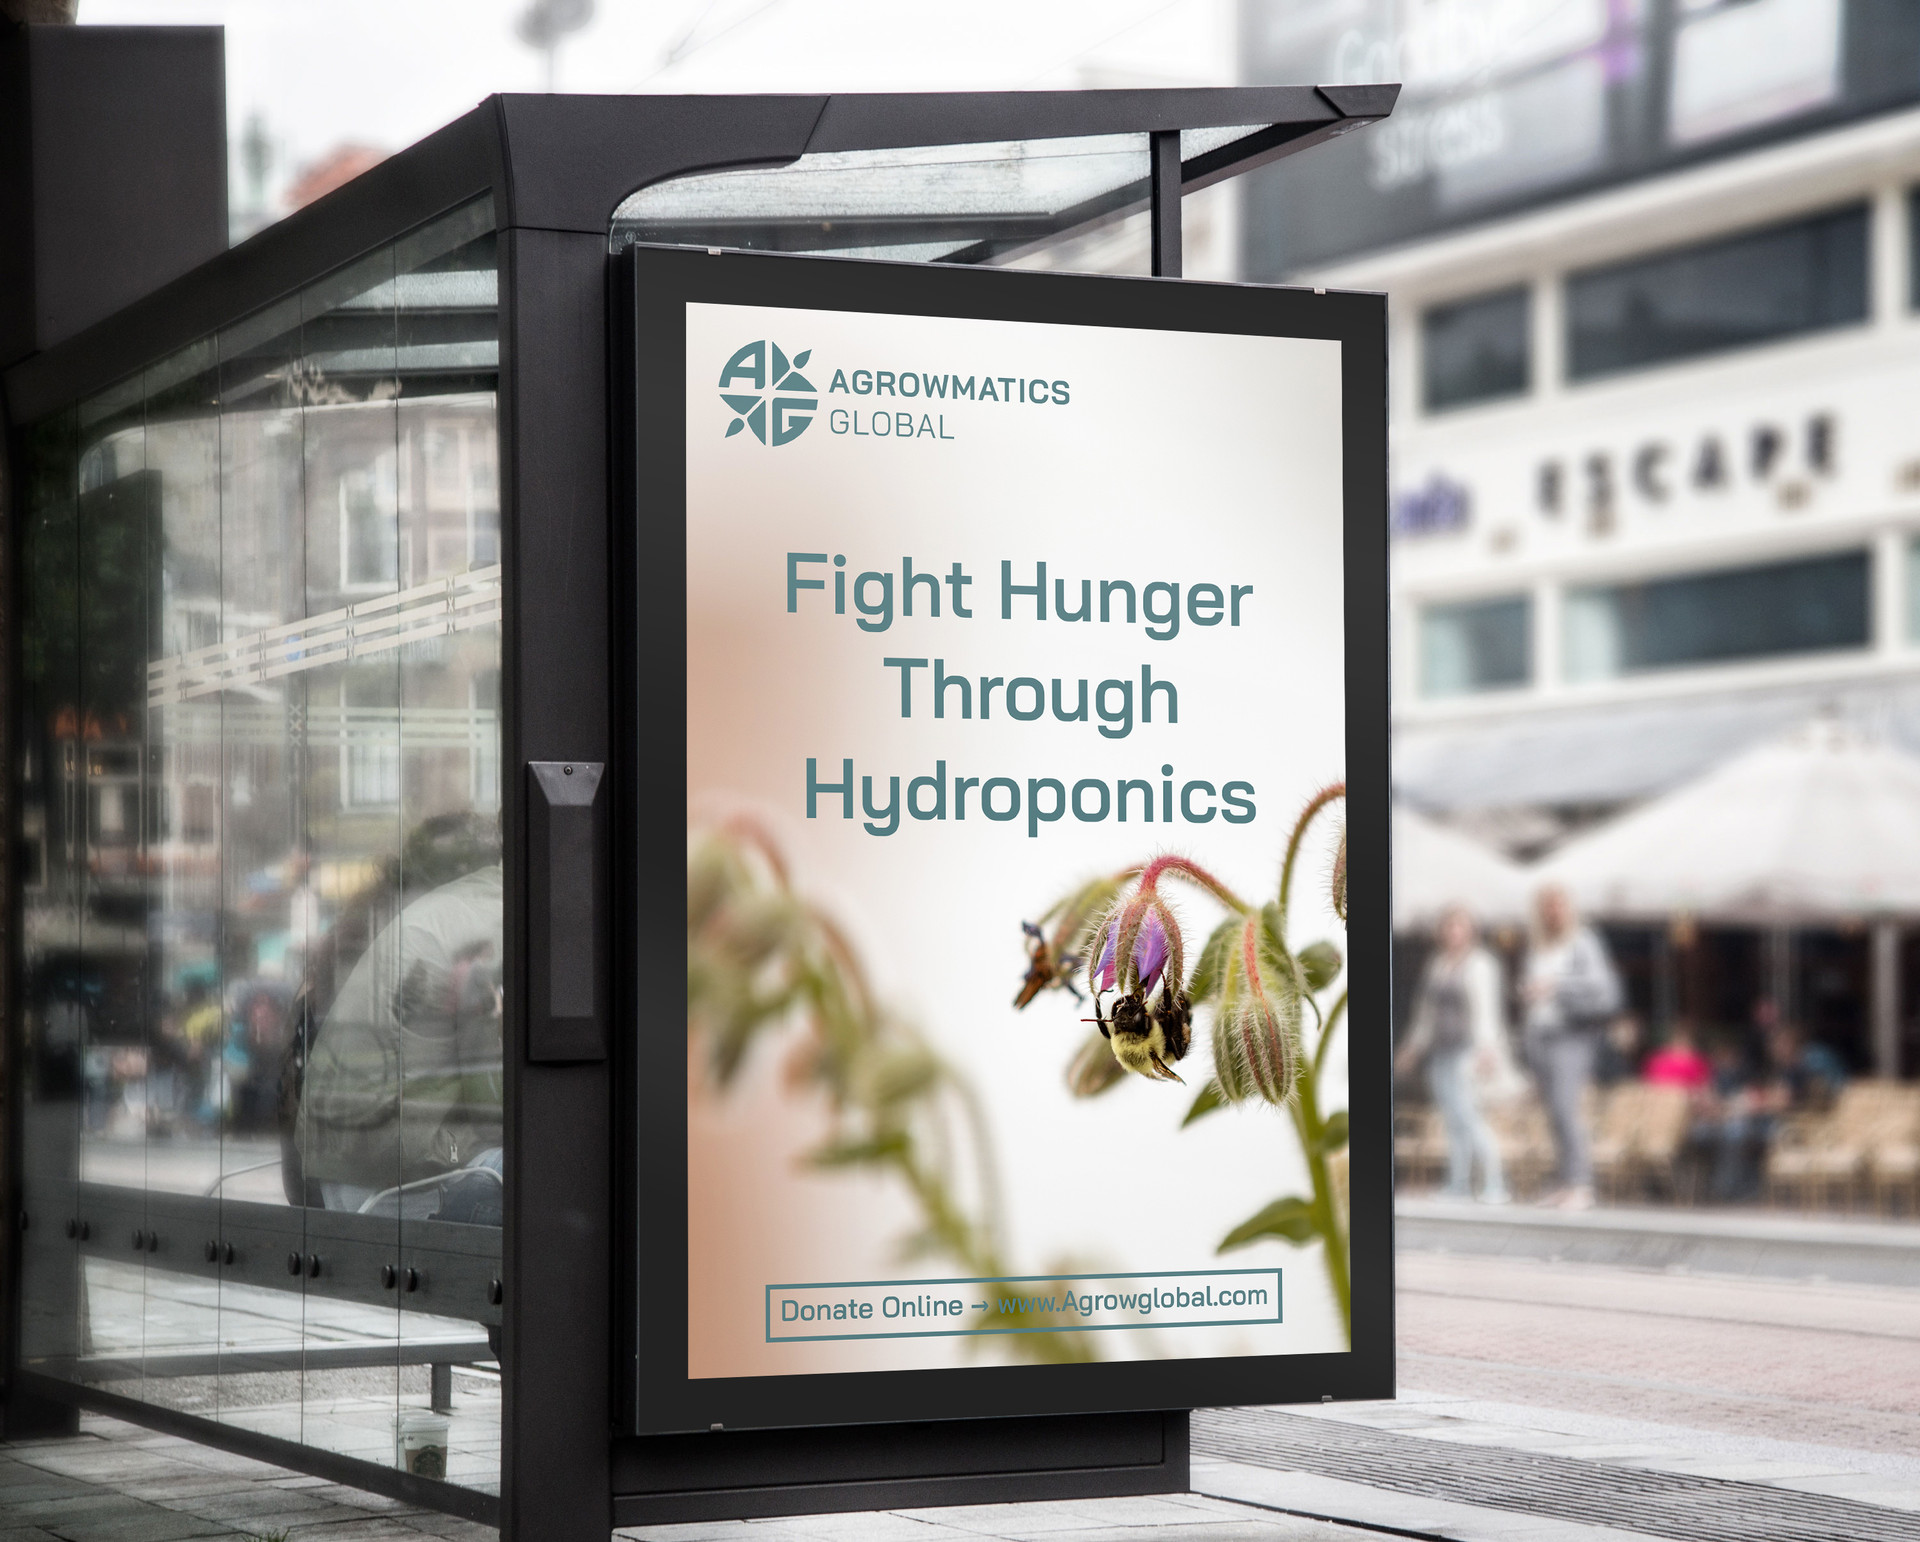 Agrowmatics Global Design Campaign